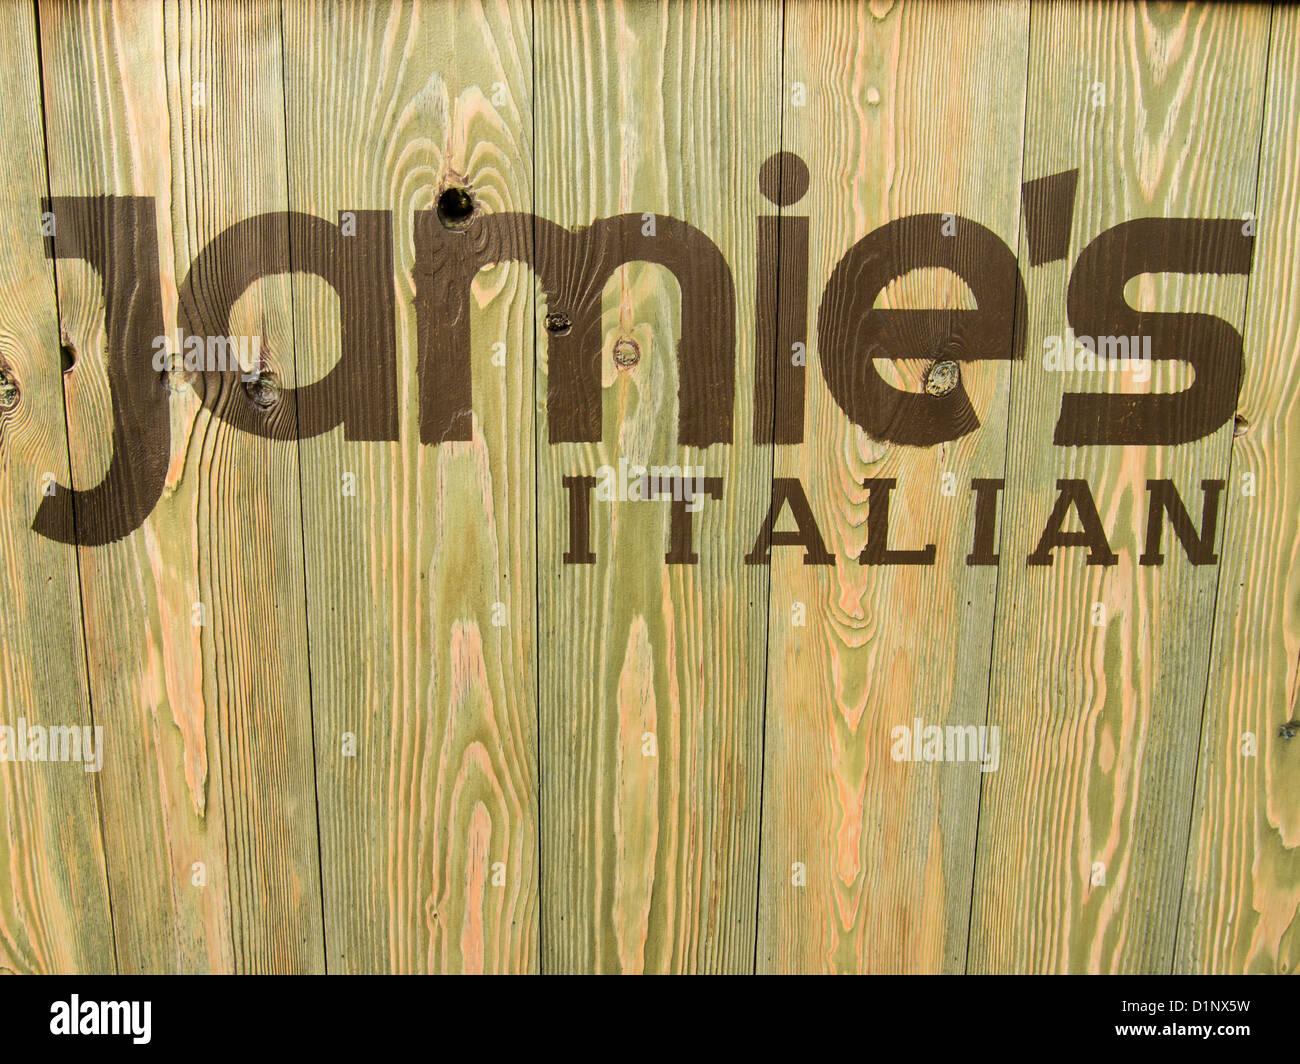 The Logo For The Jamies Italian Chain Restaurants Stenciled Onto